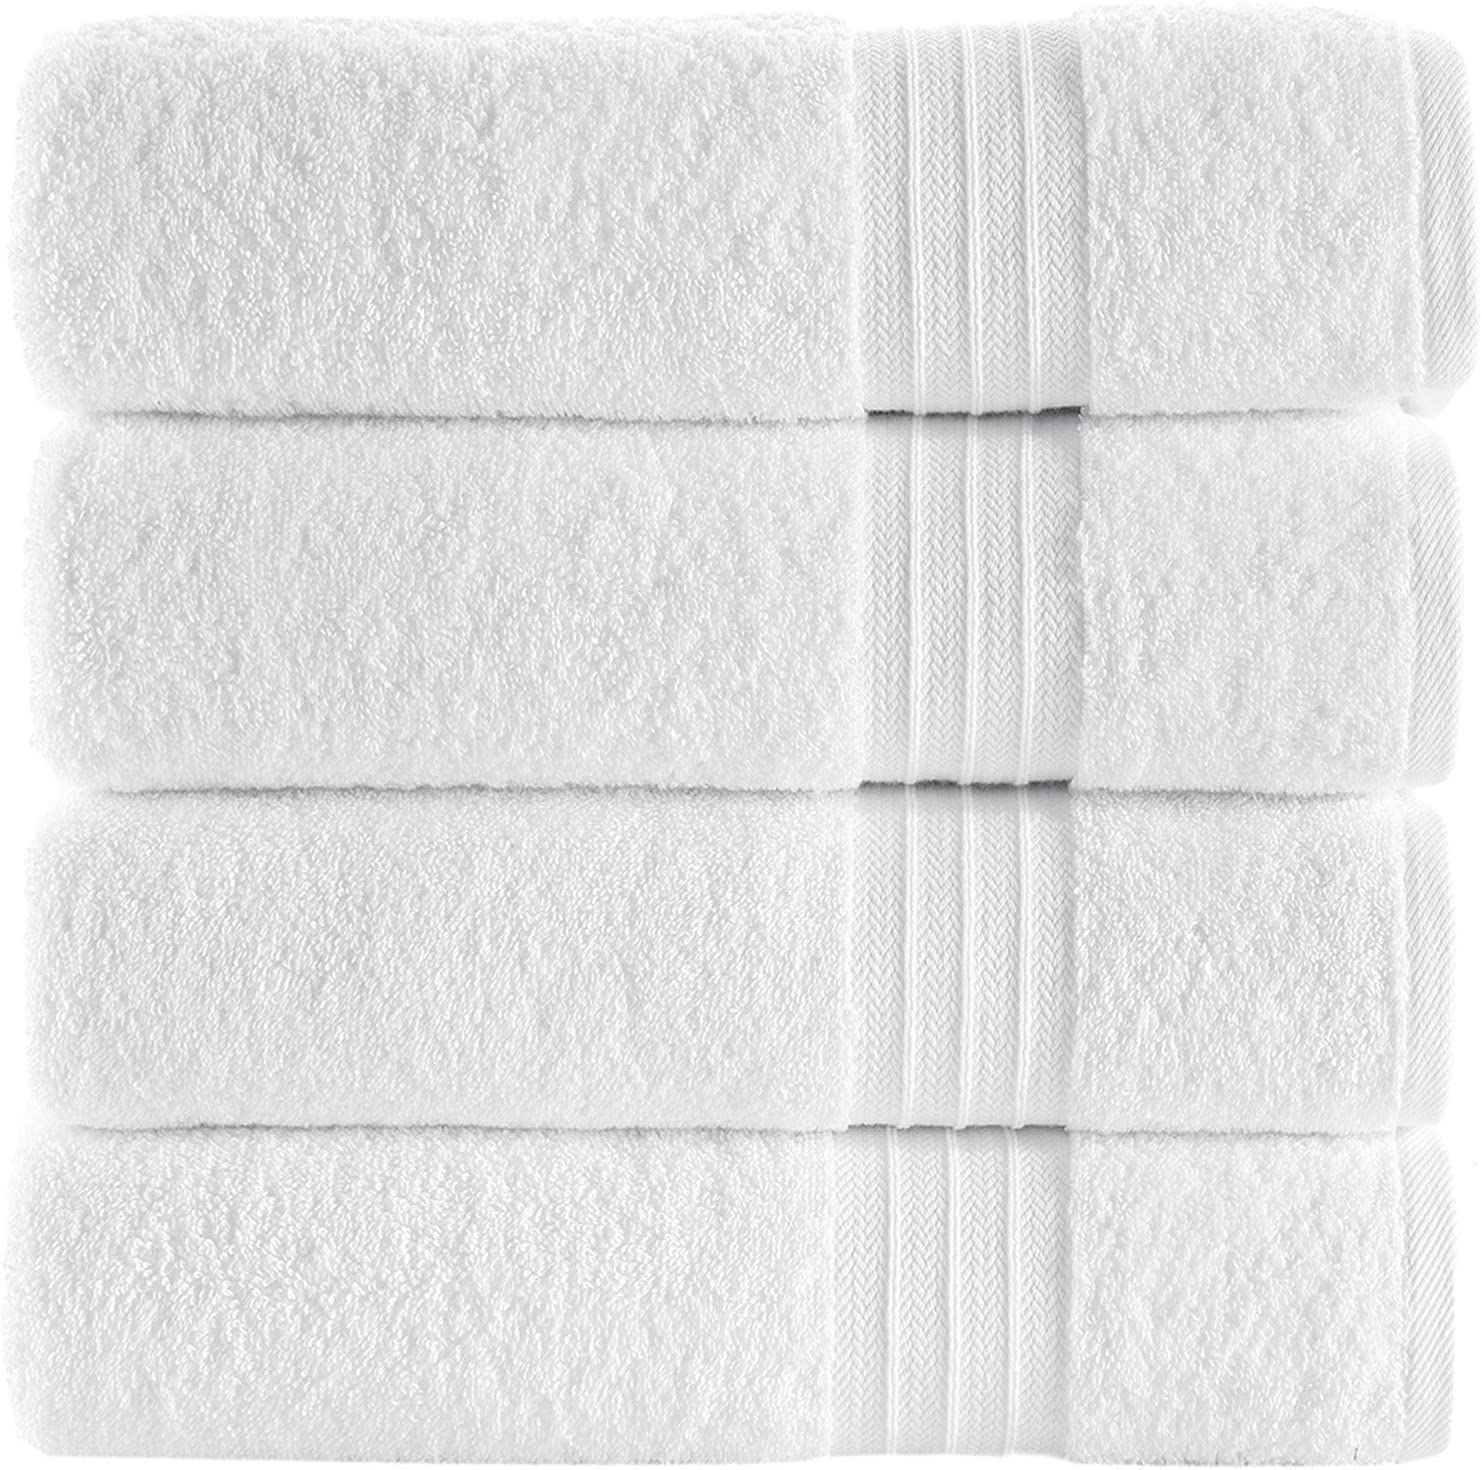 Qute Home 4-Piece Bath Towels Set, Bosporus Collection 100% Turkish Cotton Premium Quality Towels for Bathroom, Quick Dry Soft and Absorbent Turkish Towel, Set Includes 4 Bath Towels (White)